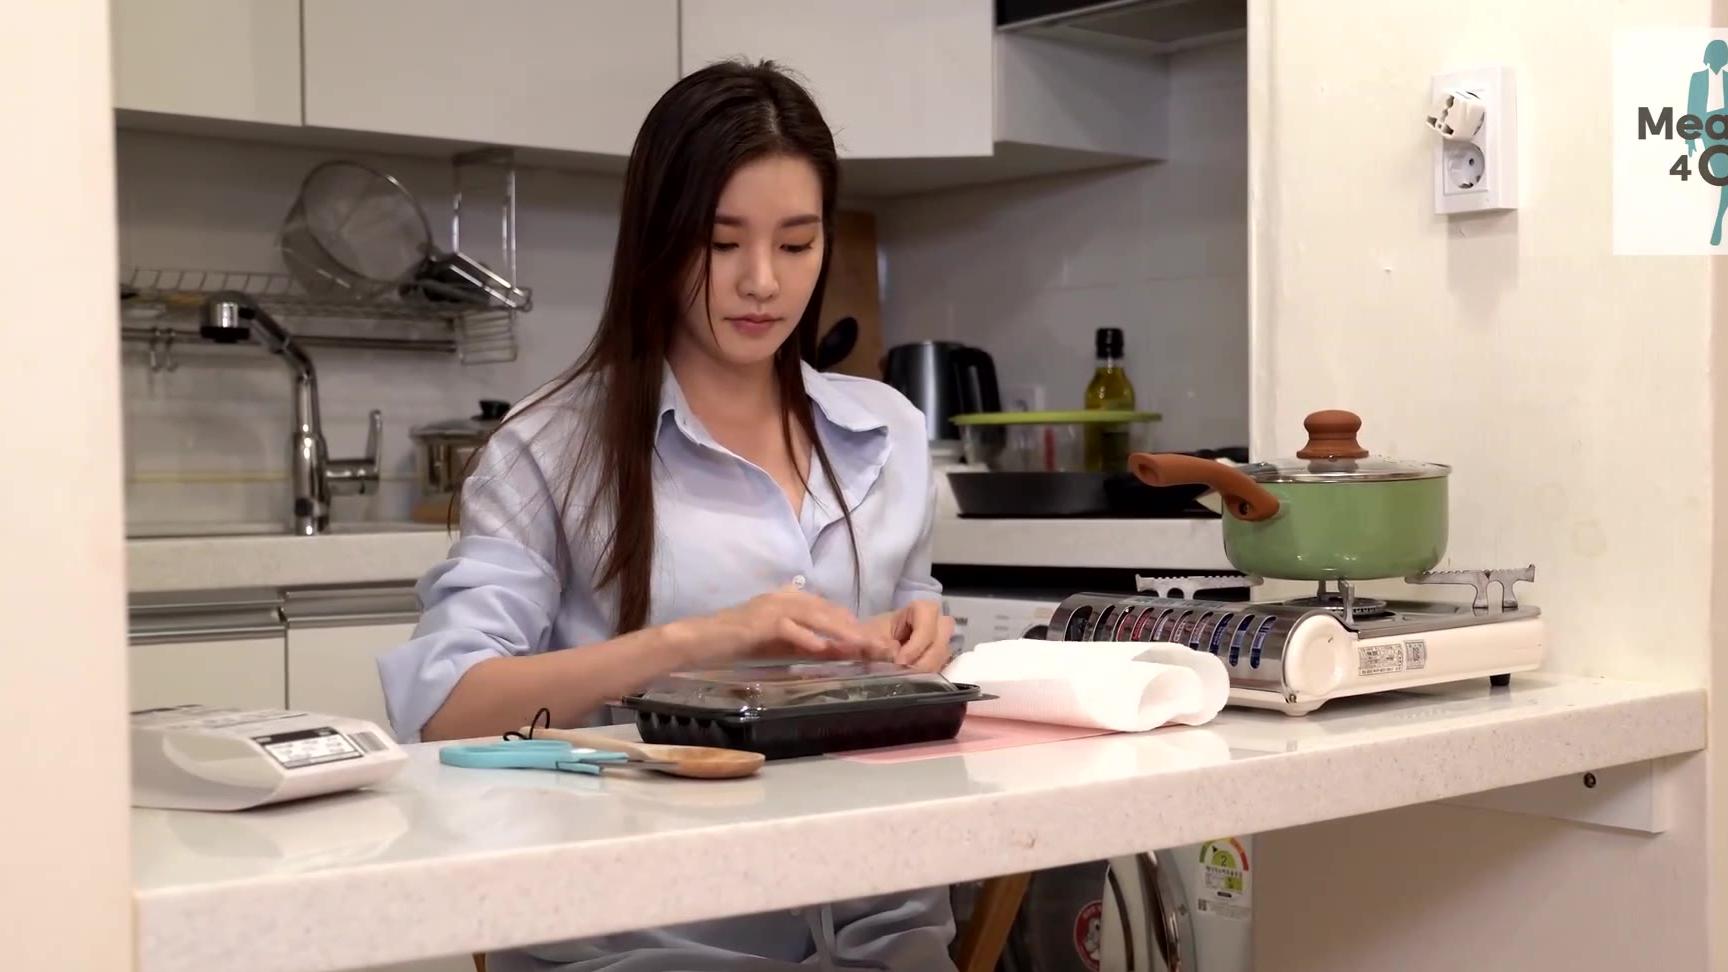 【4K】Meal Kit 4 OL_上班族妹子的日常与美食系列EP31 (P1. 紫菜牛肉